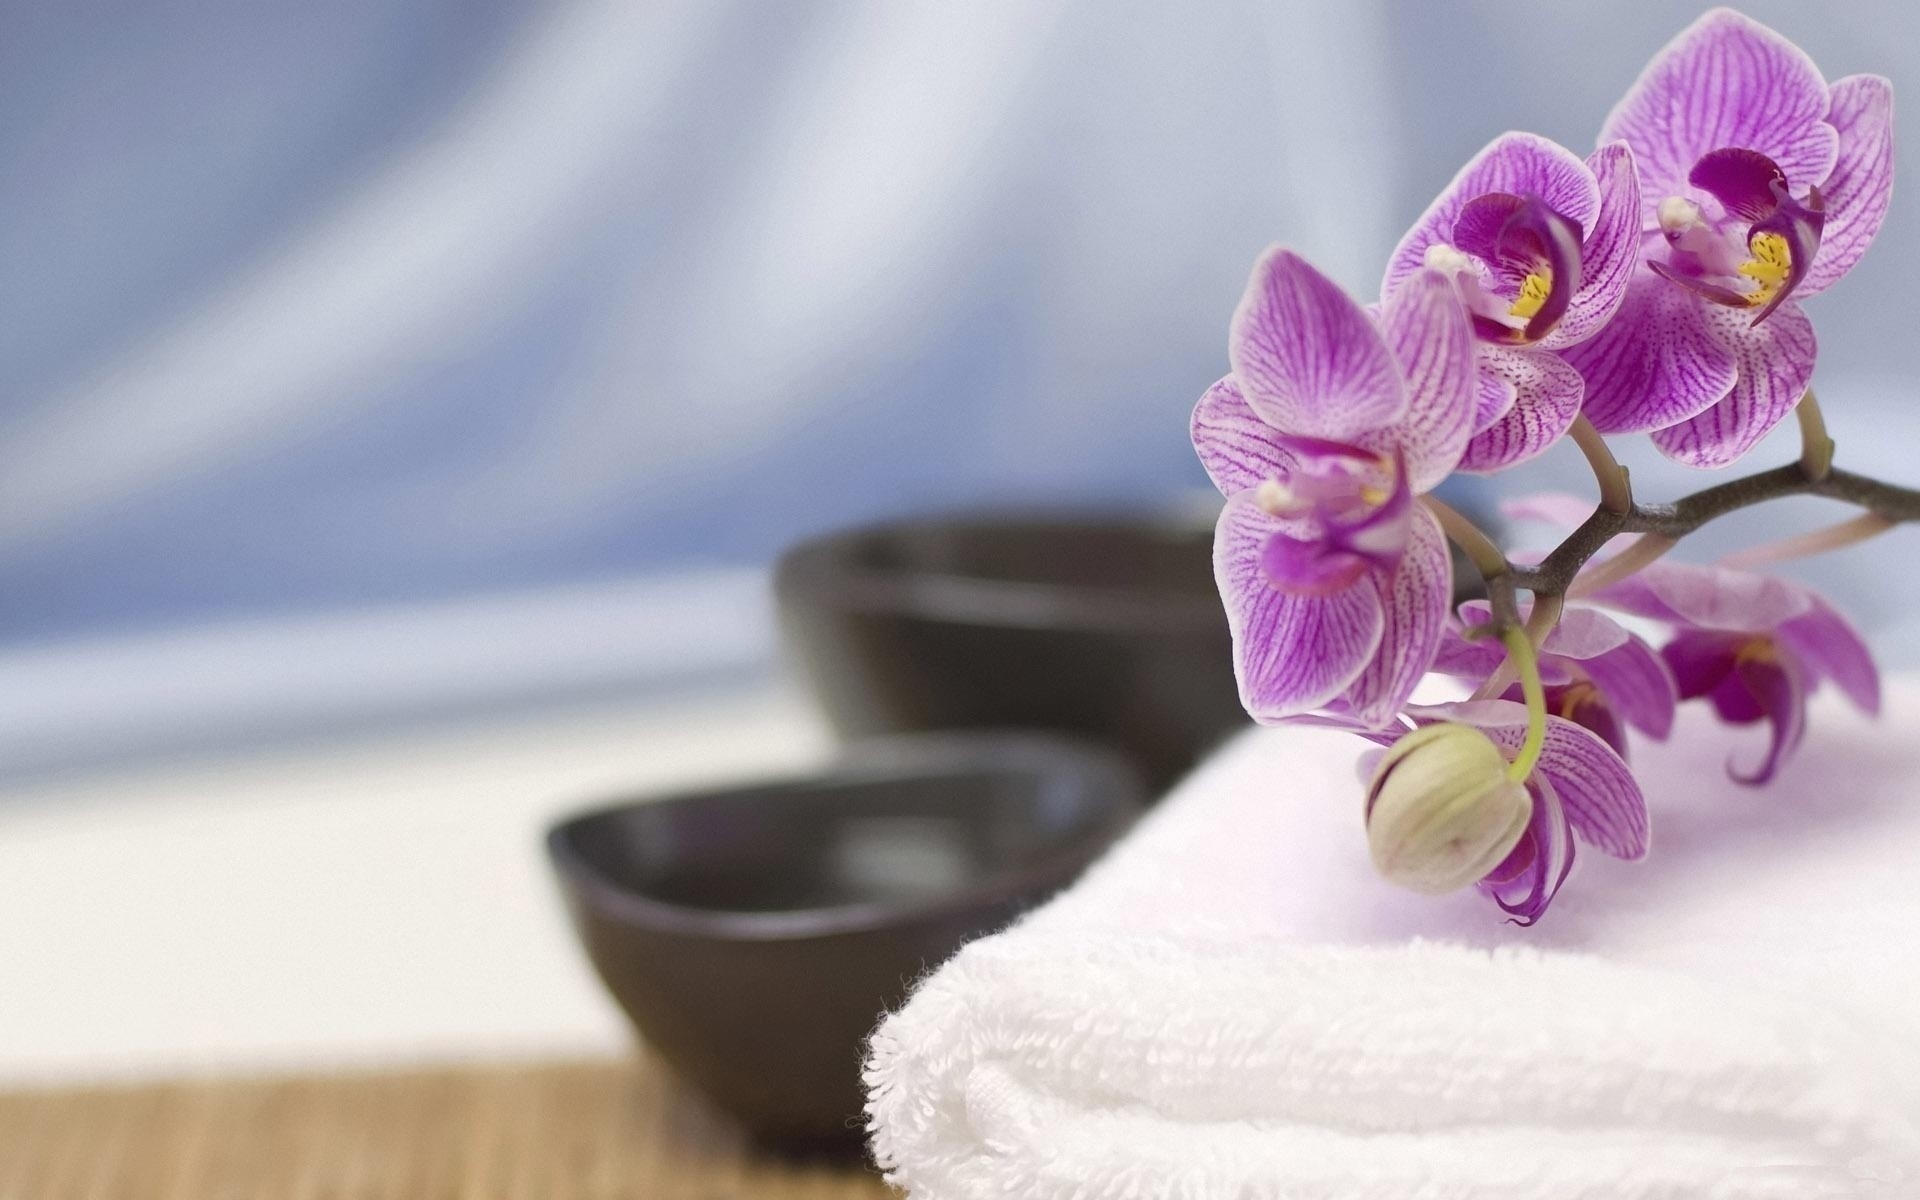 орхидея картинки спа